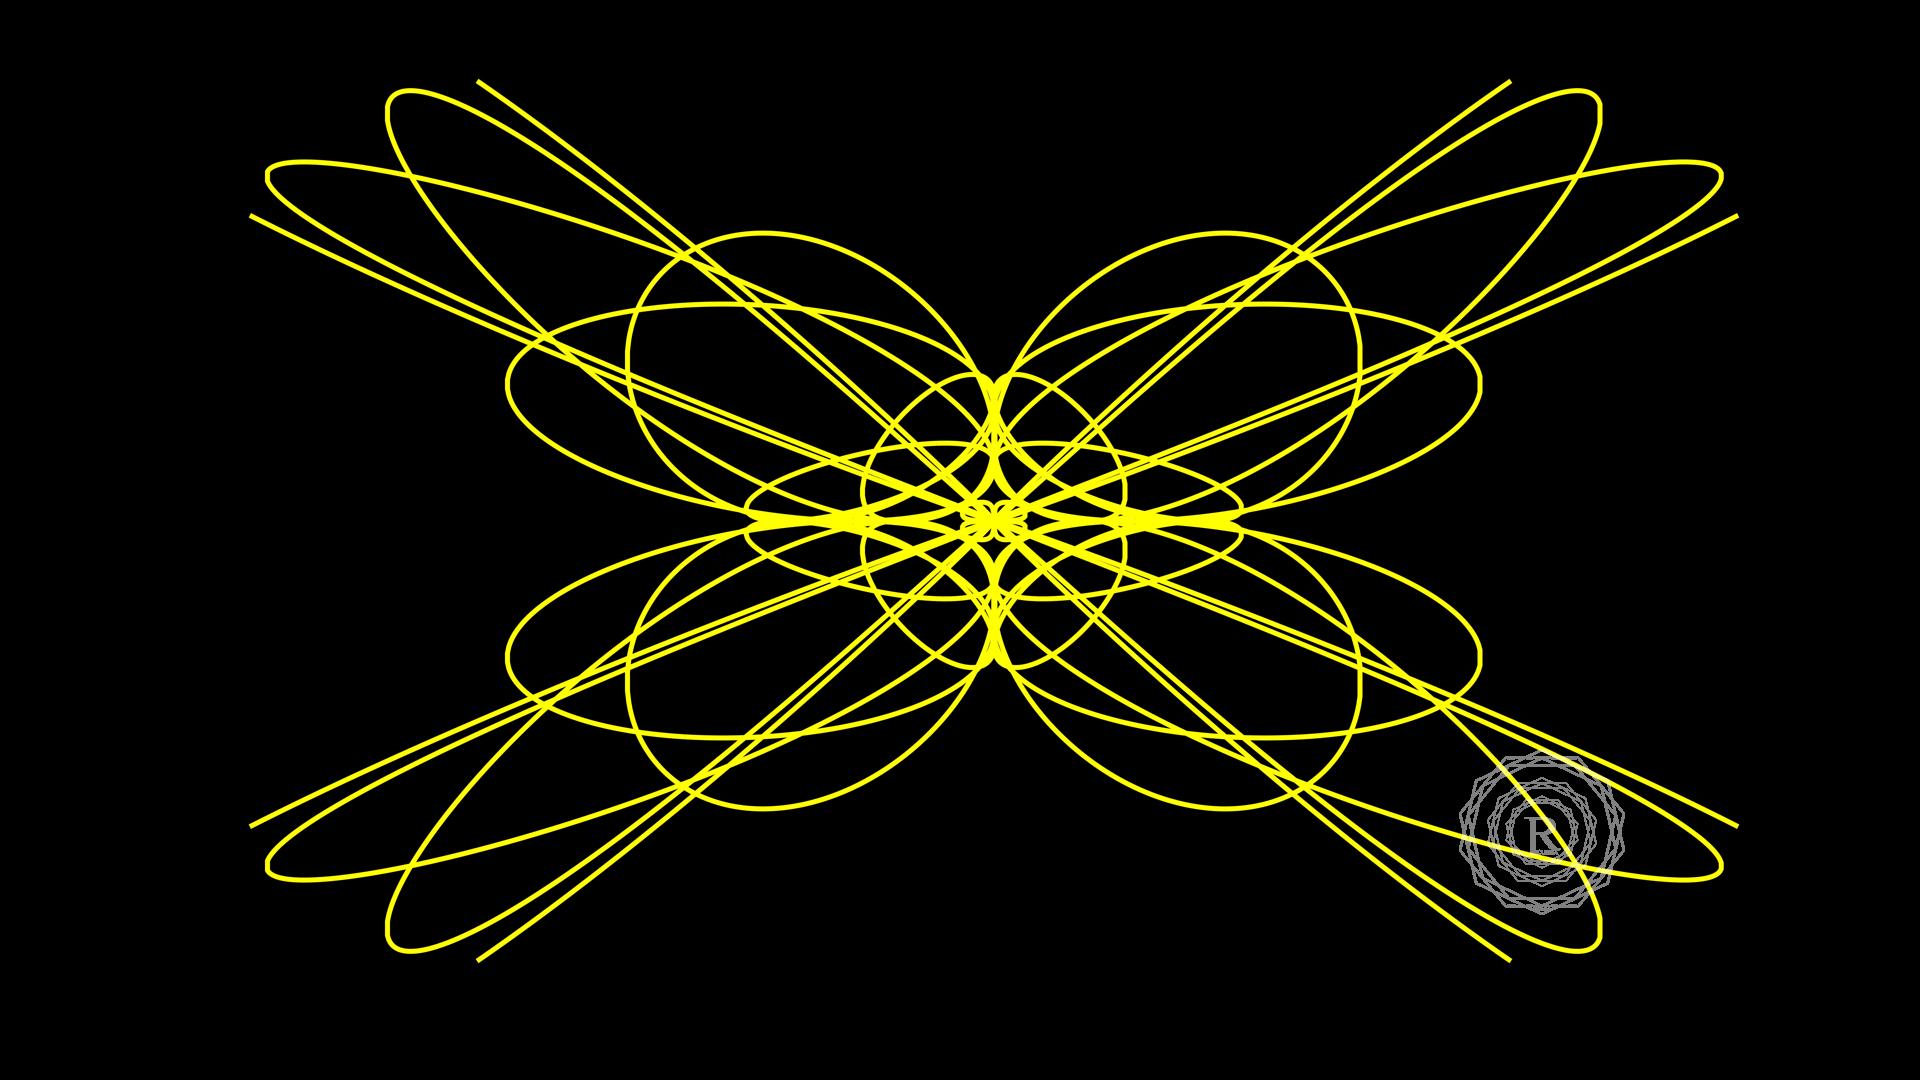 00090Resized_Geometry_copyright_Recursia